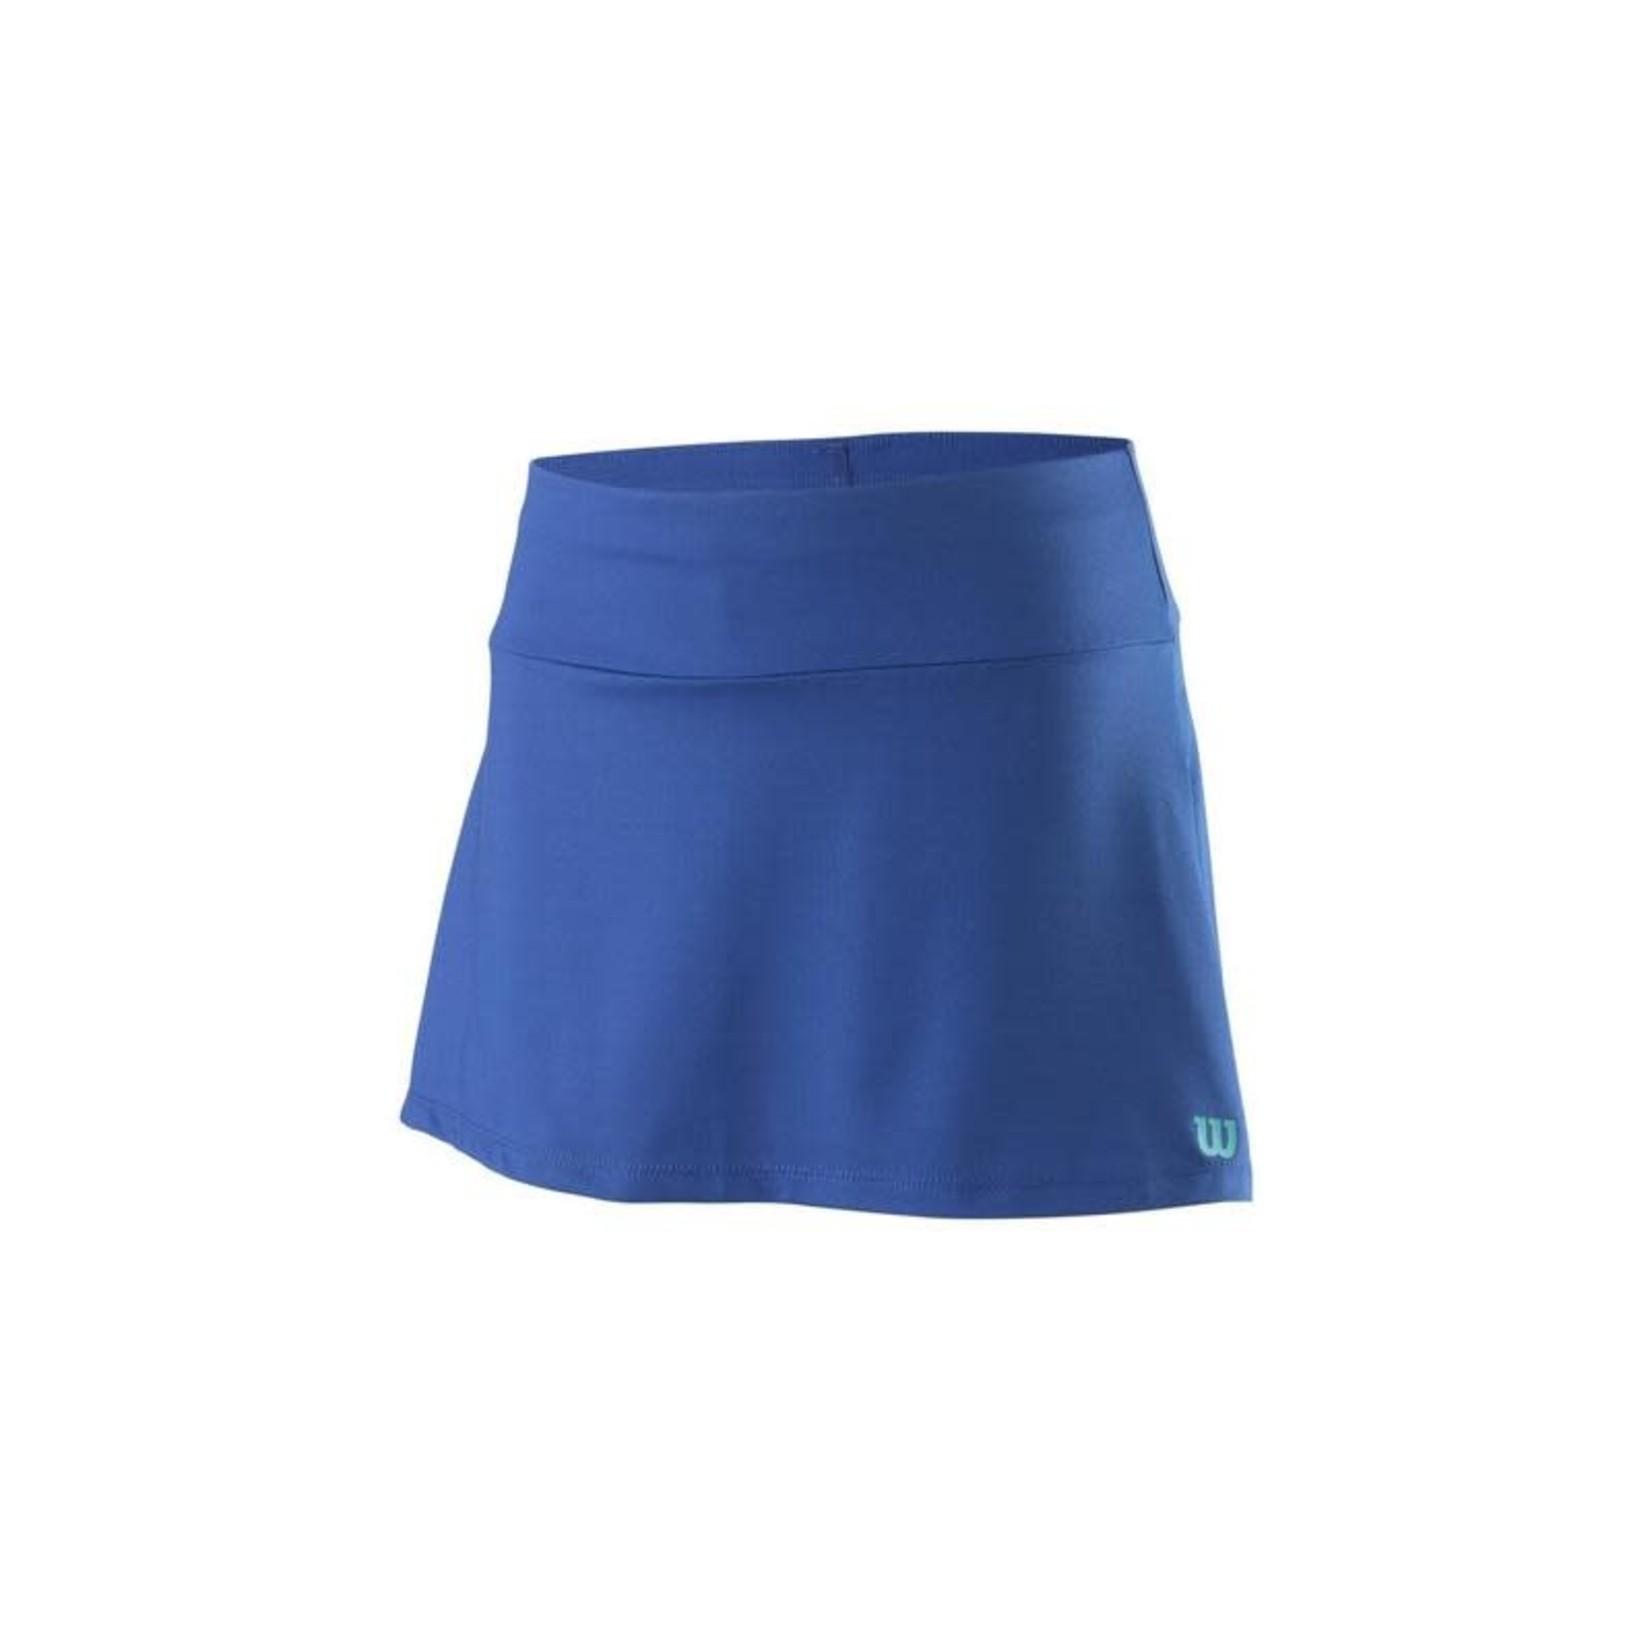 Wilson Meisjes - Competition 11 Skirt Blauw